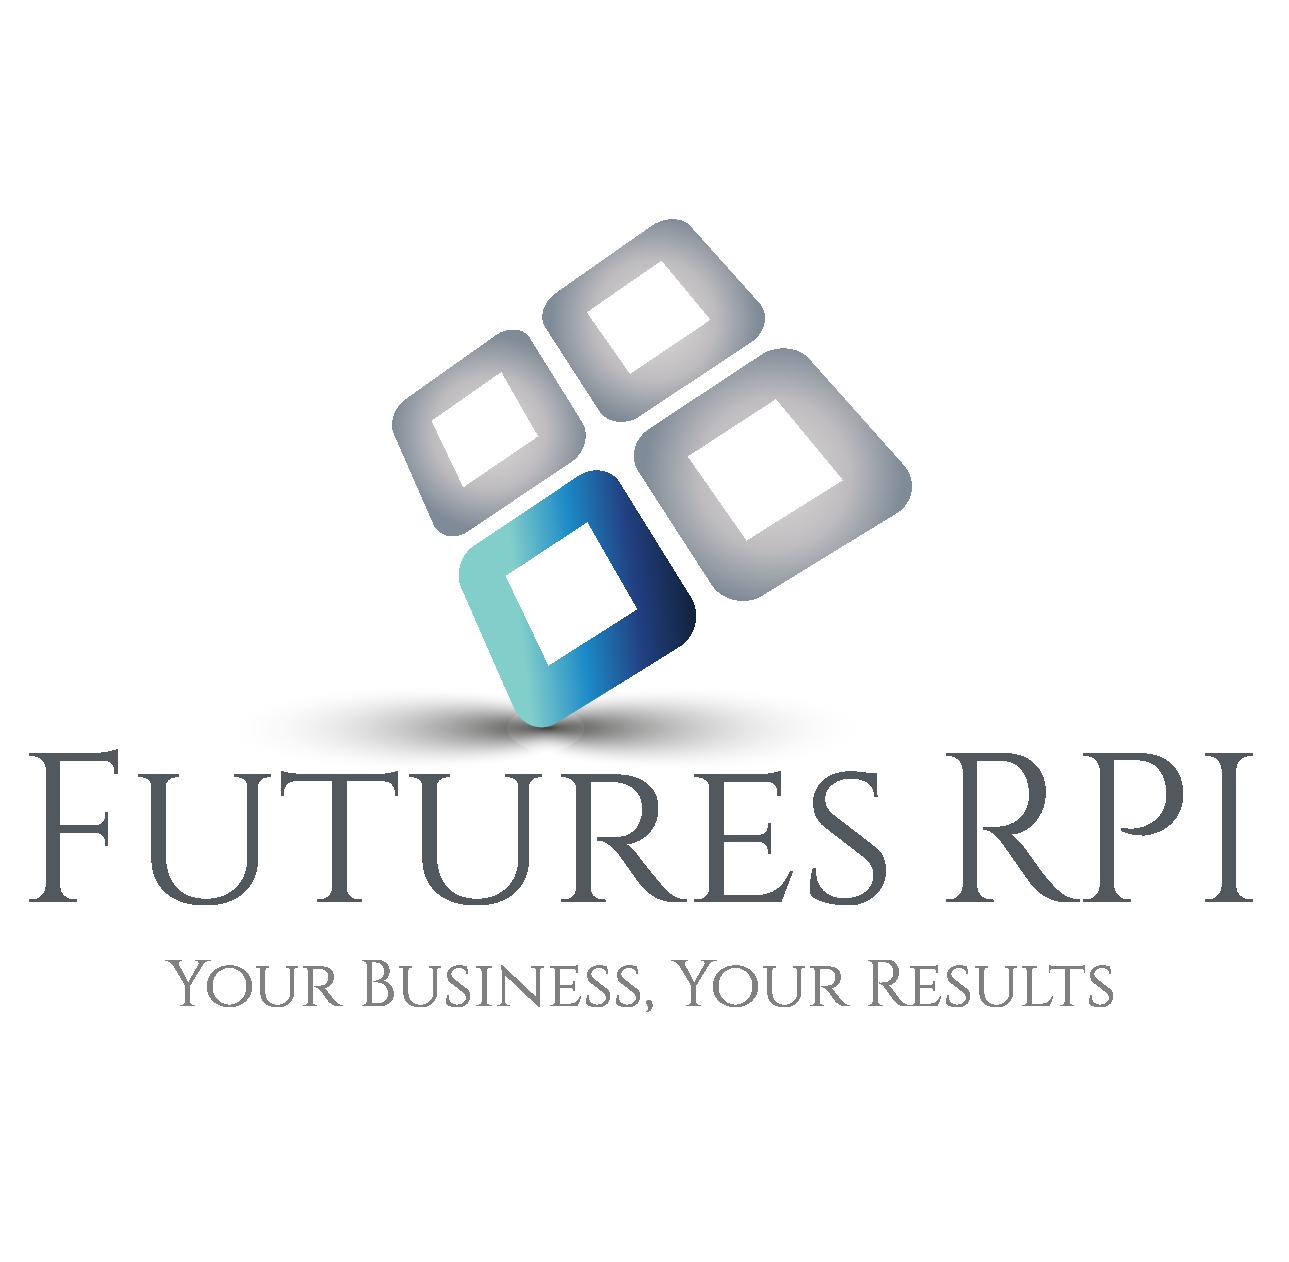 Futures RPI